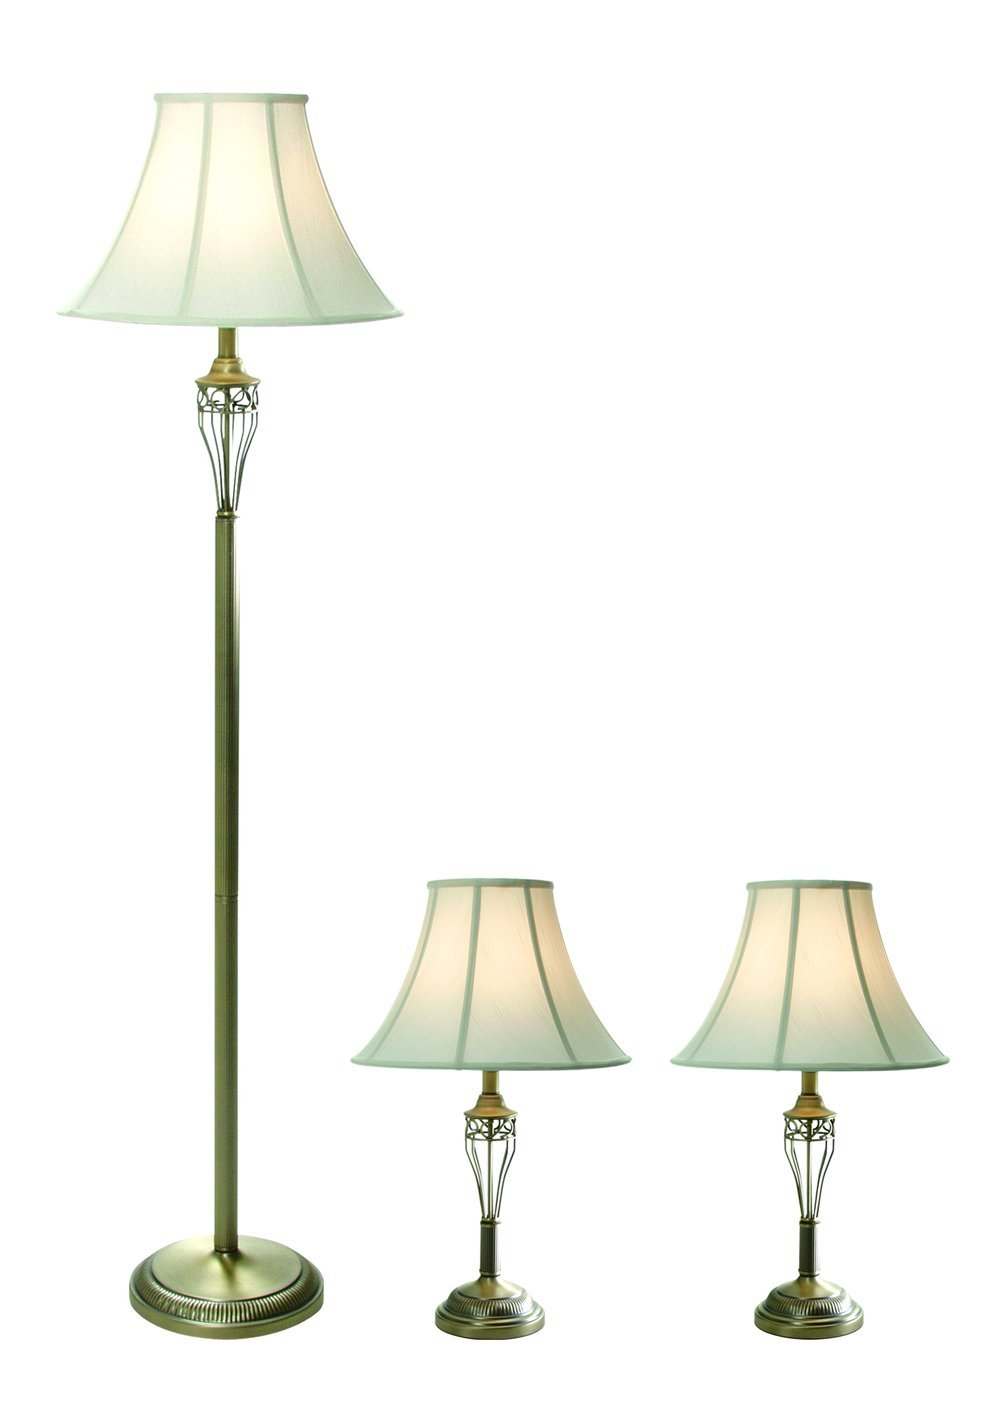 Elegant Designs LC1001-ABS Three Pack Lamp Set (2 Table Lamps, 1 Floor Lamp), 7'' x 16'' x 25'', Antique Brass